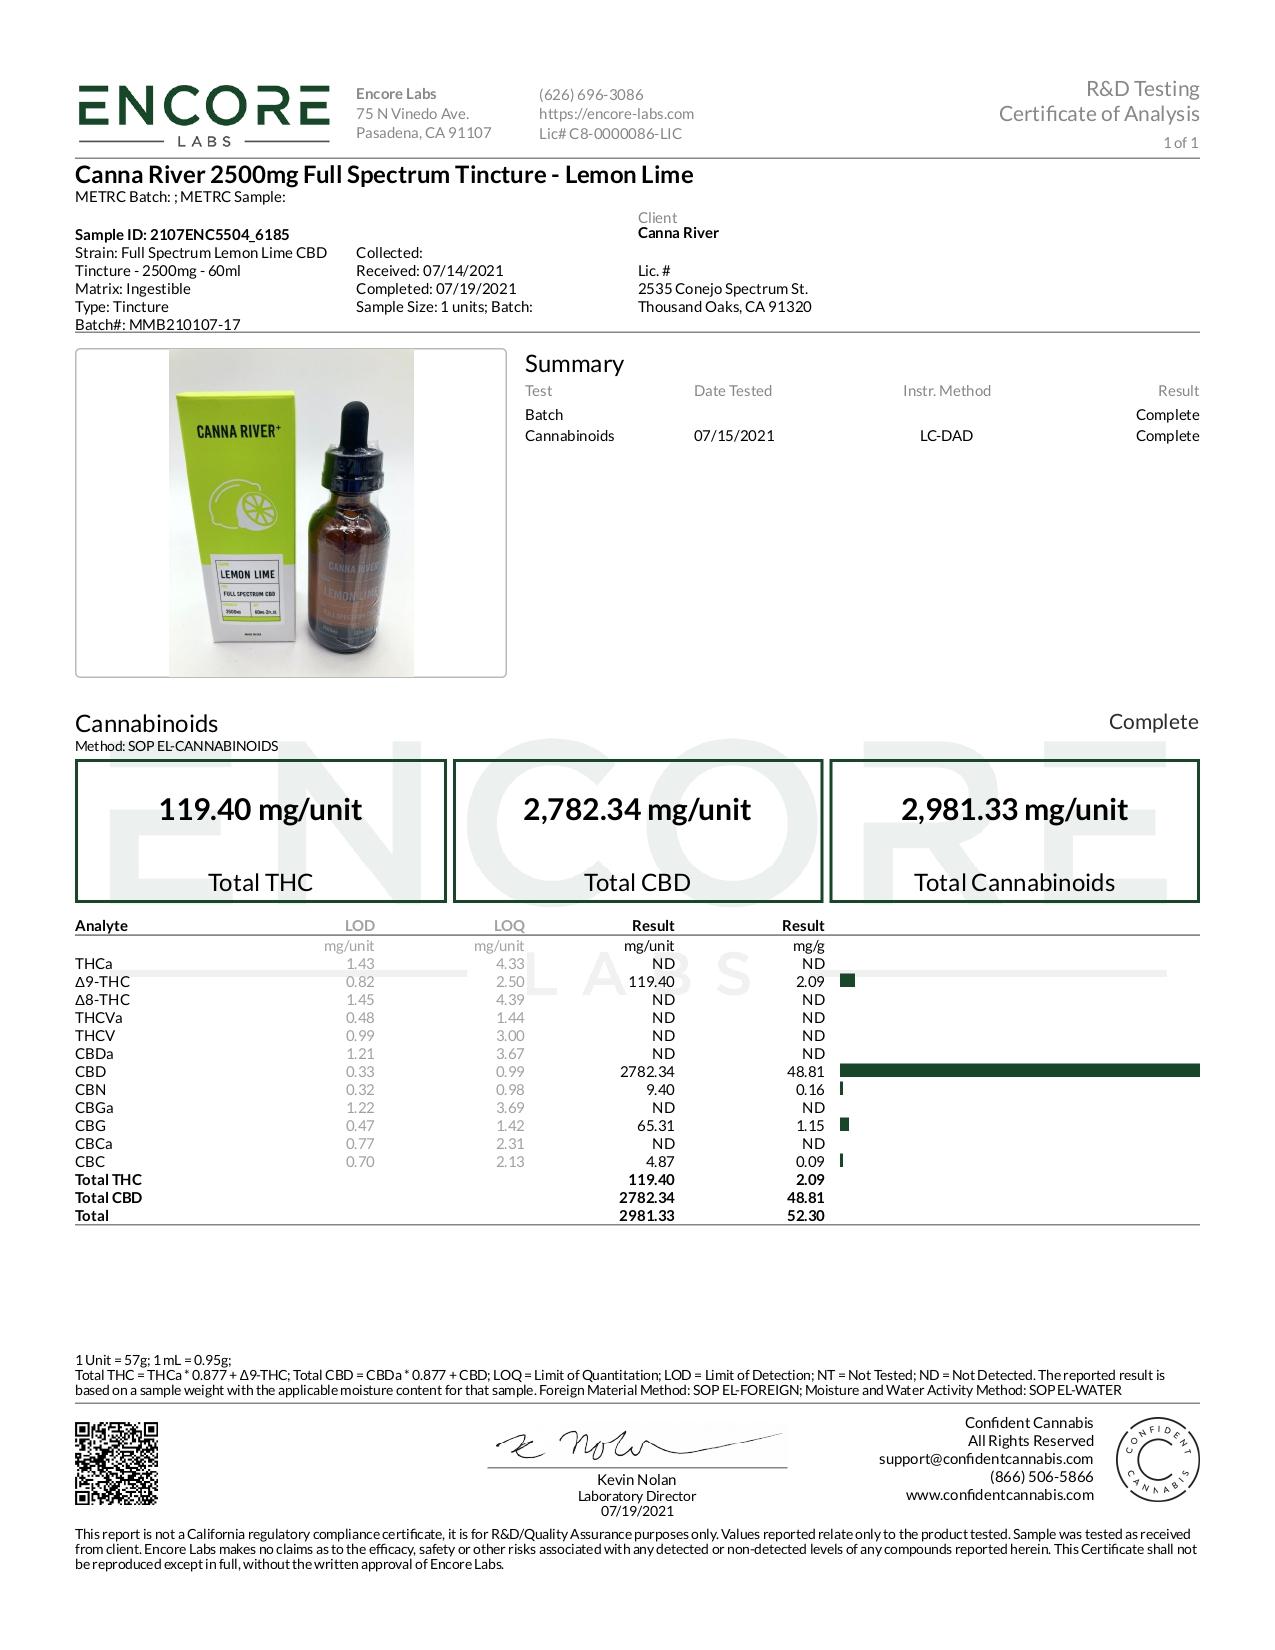 Canna River CBD Tincture Full Spectrum Lemon Lime Lab Report 2500mg